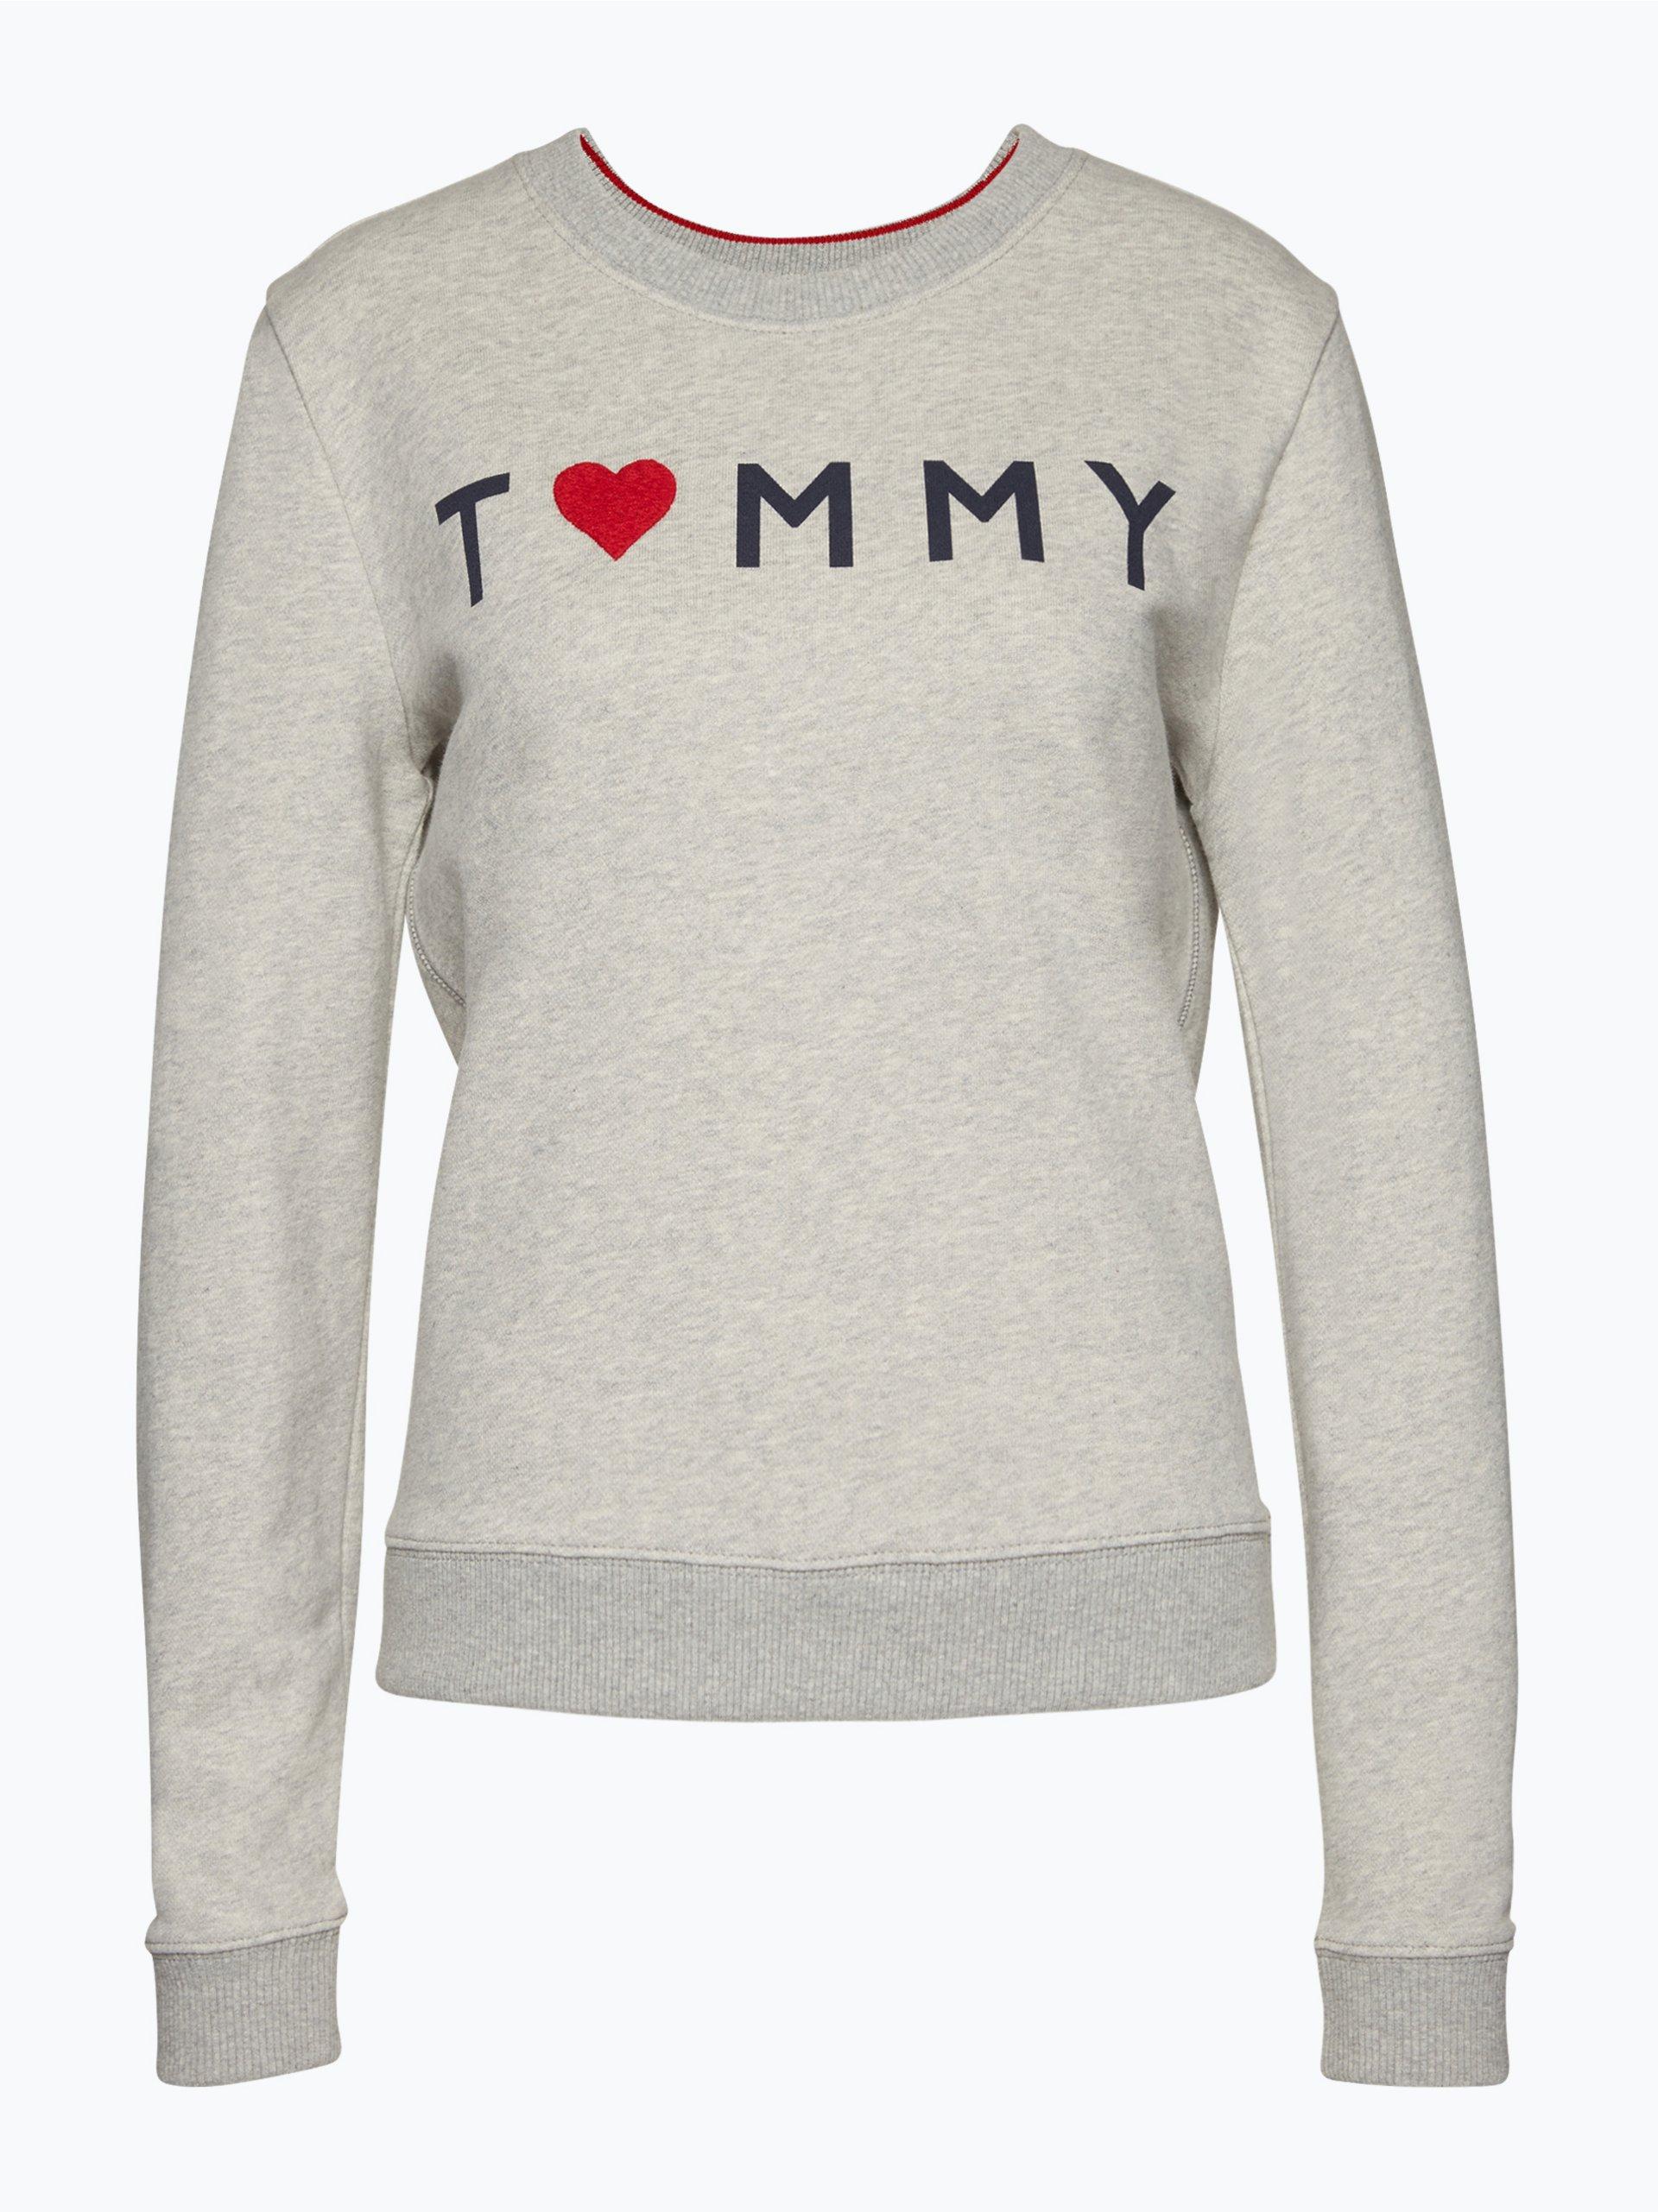 tommy hilfiger damen sweatshirt grau gemustert online. Black Bedroom Furniture Sets. Home Design Ideas